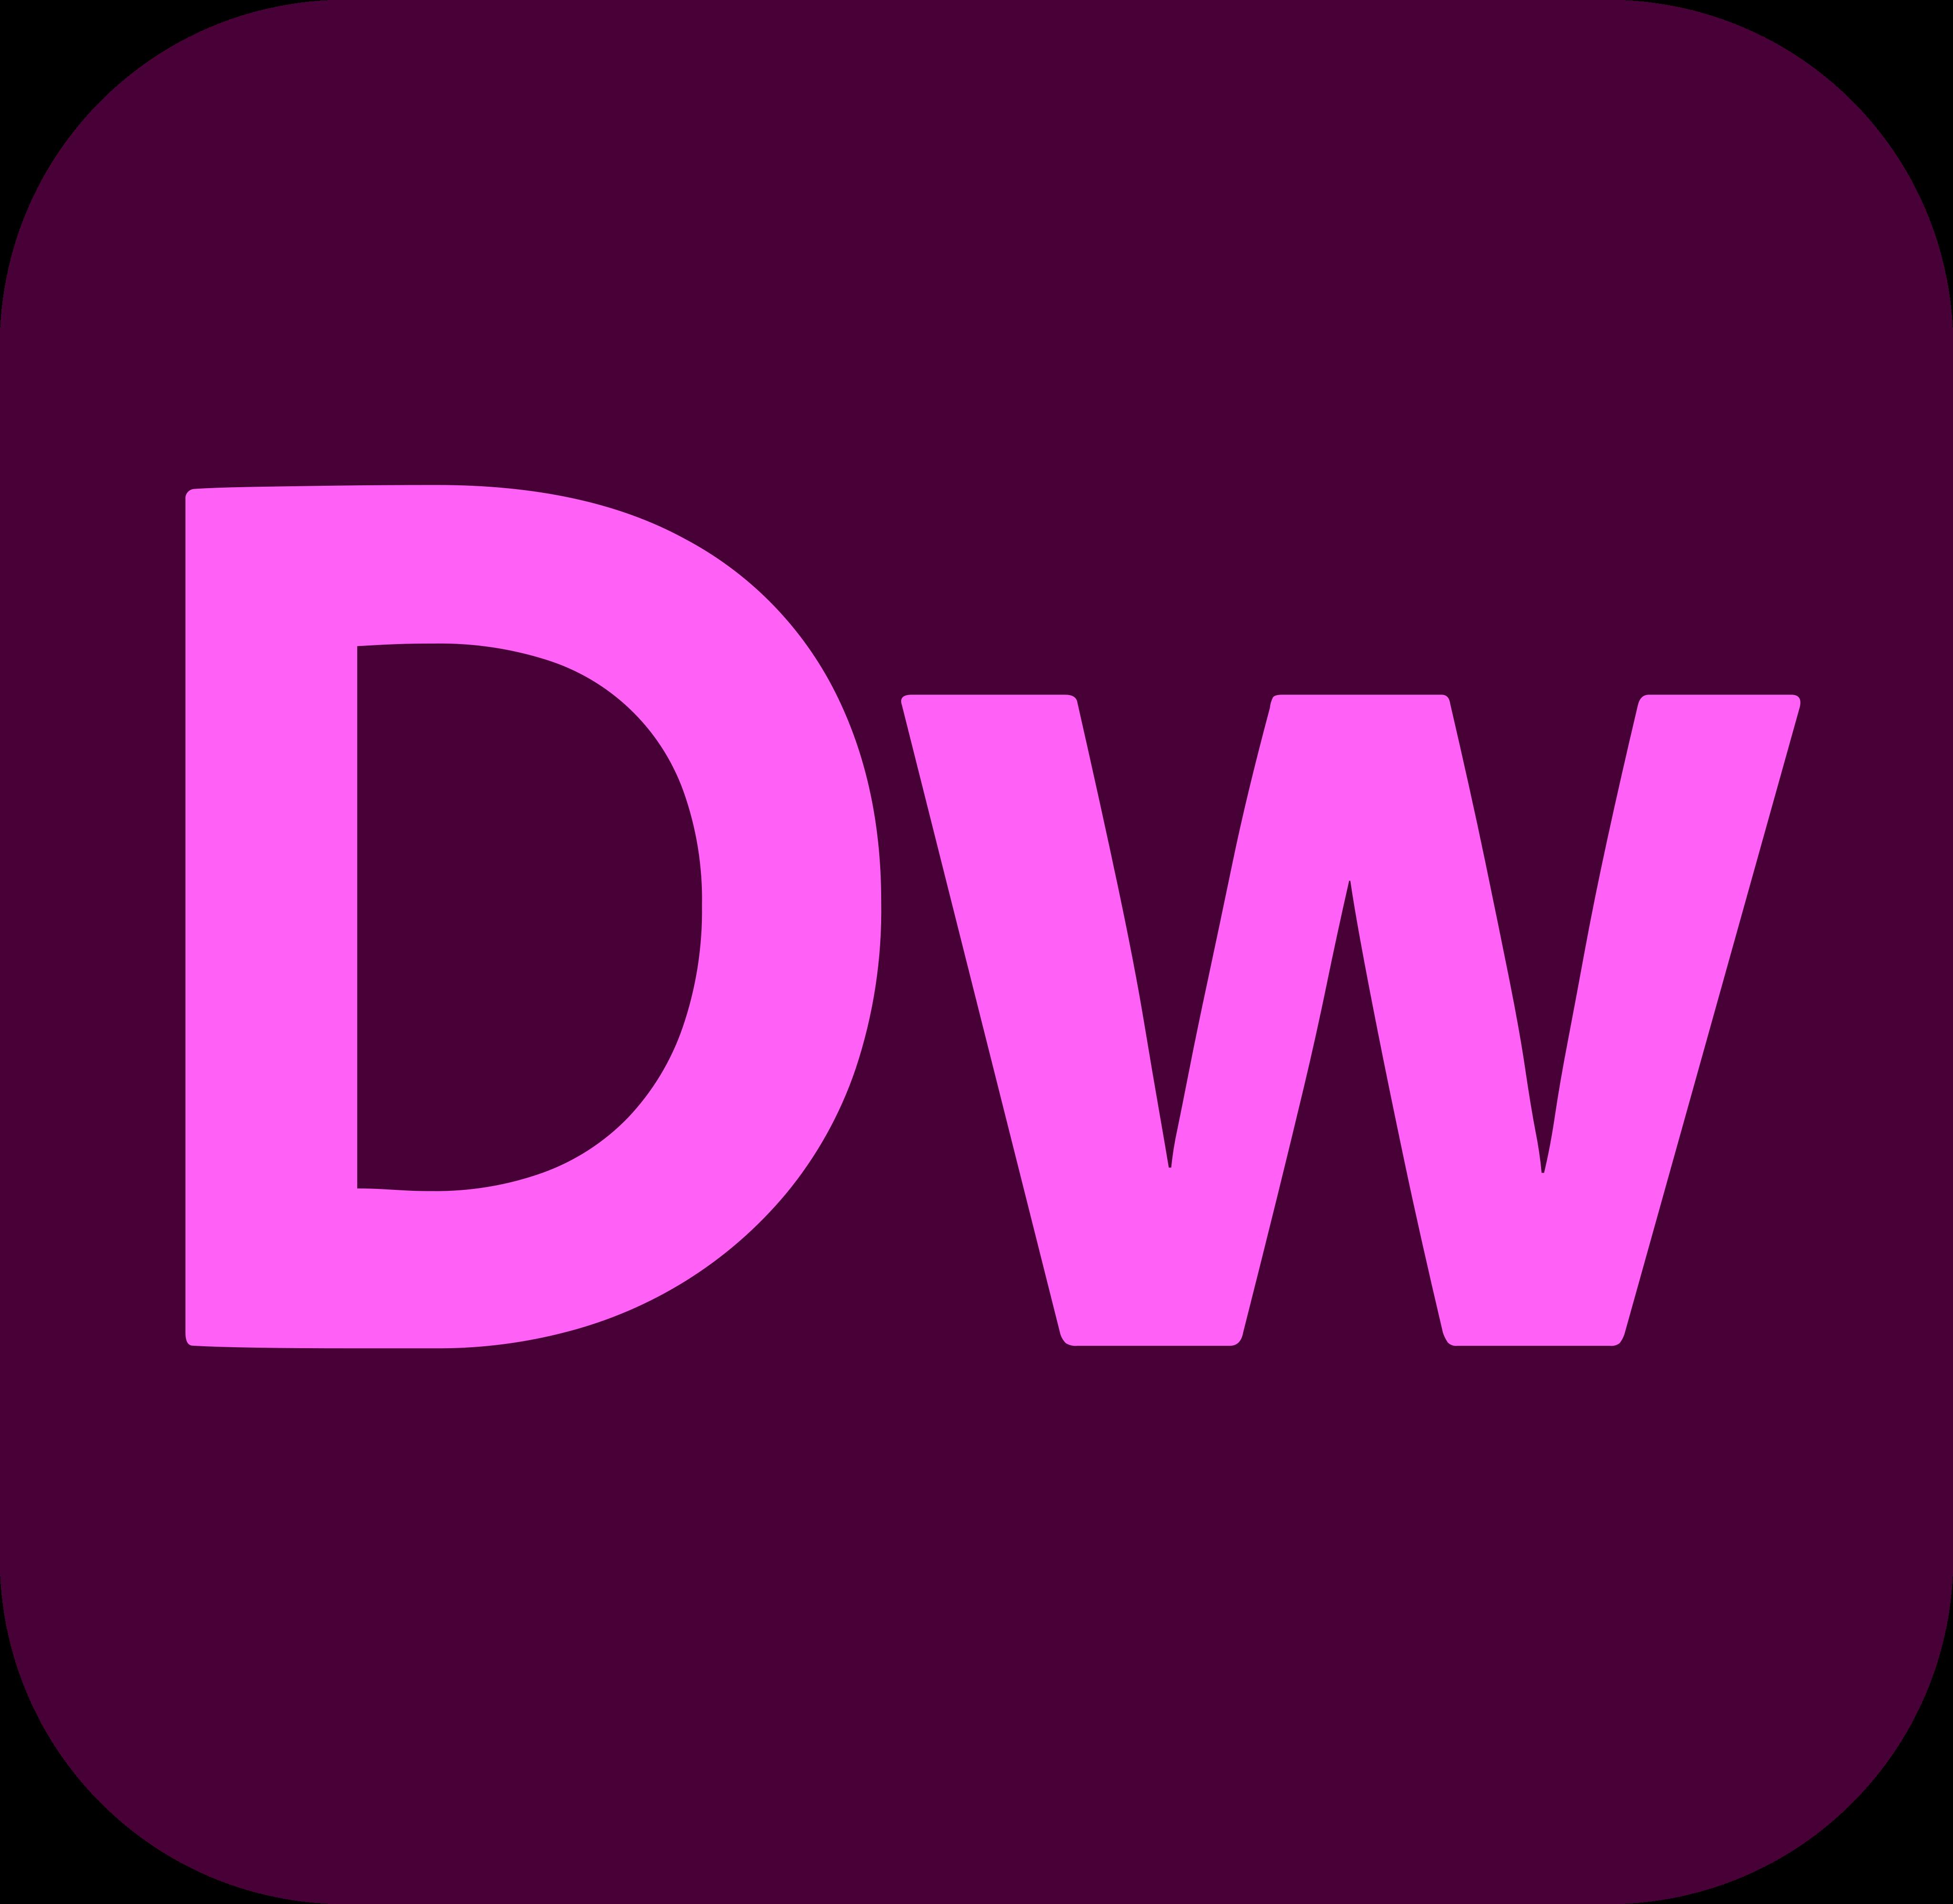 adobe dreamweaver logo 5 - Adobe Dreamweaver Logo